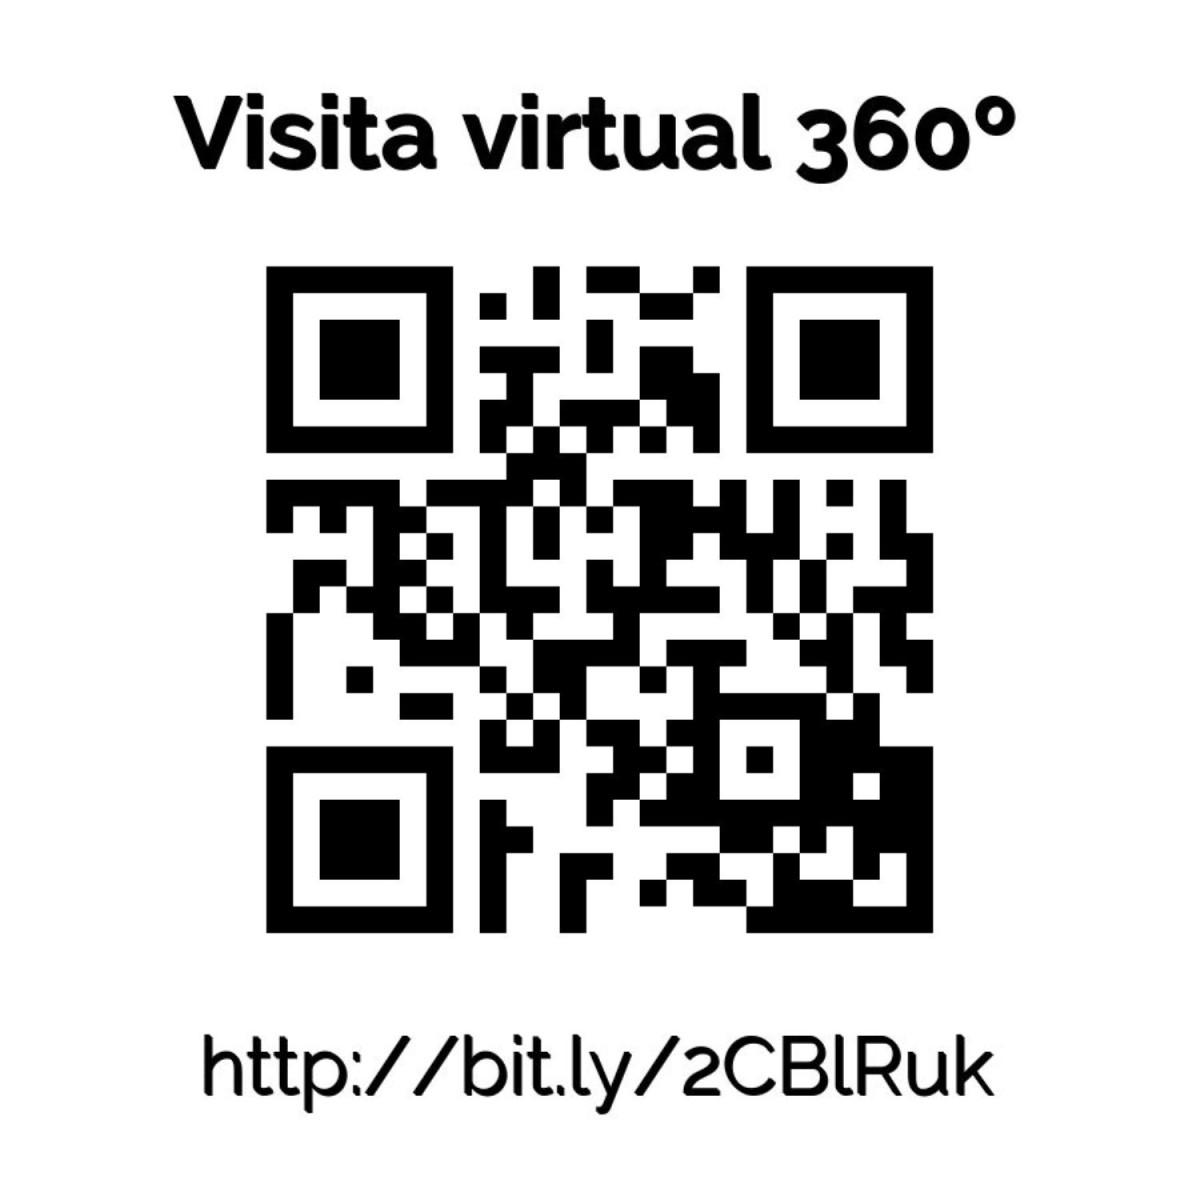 3408-03164